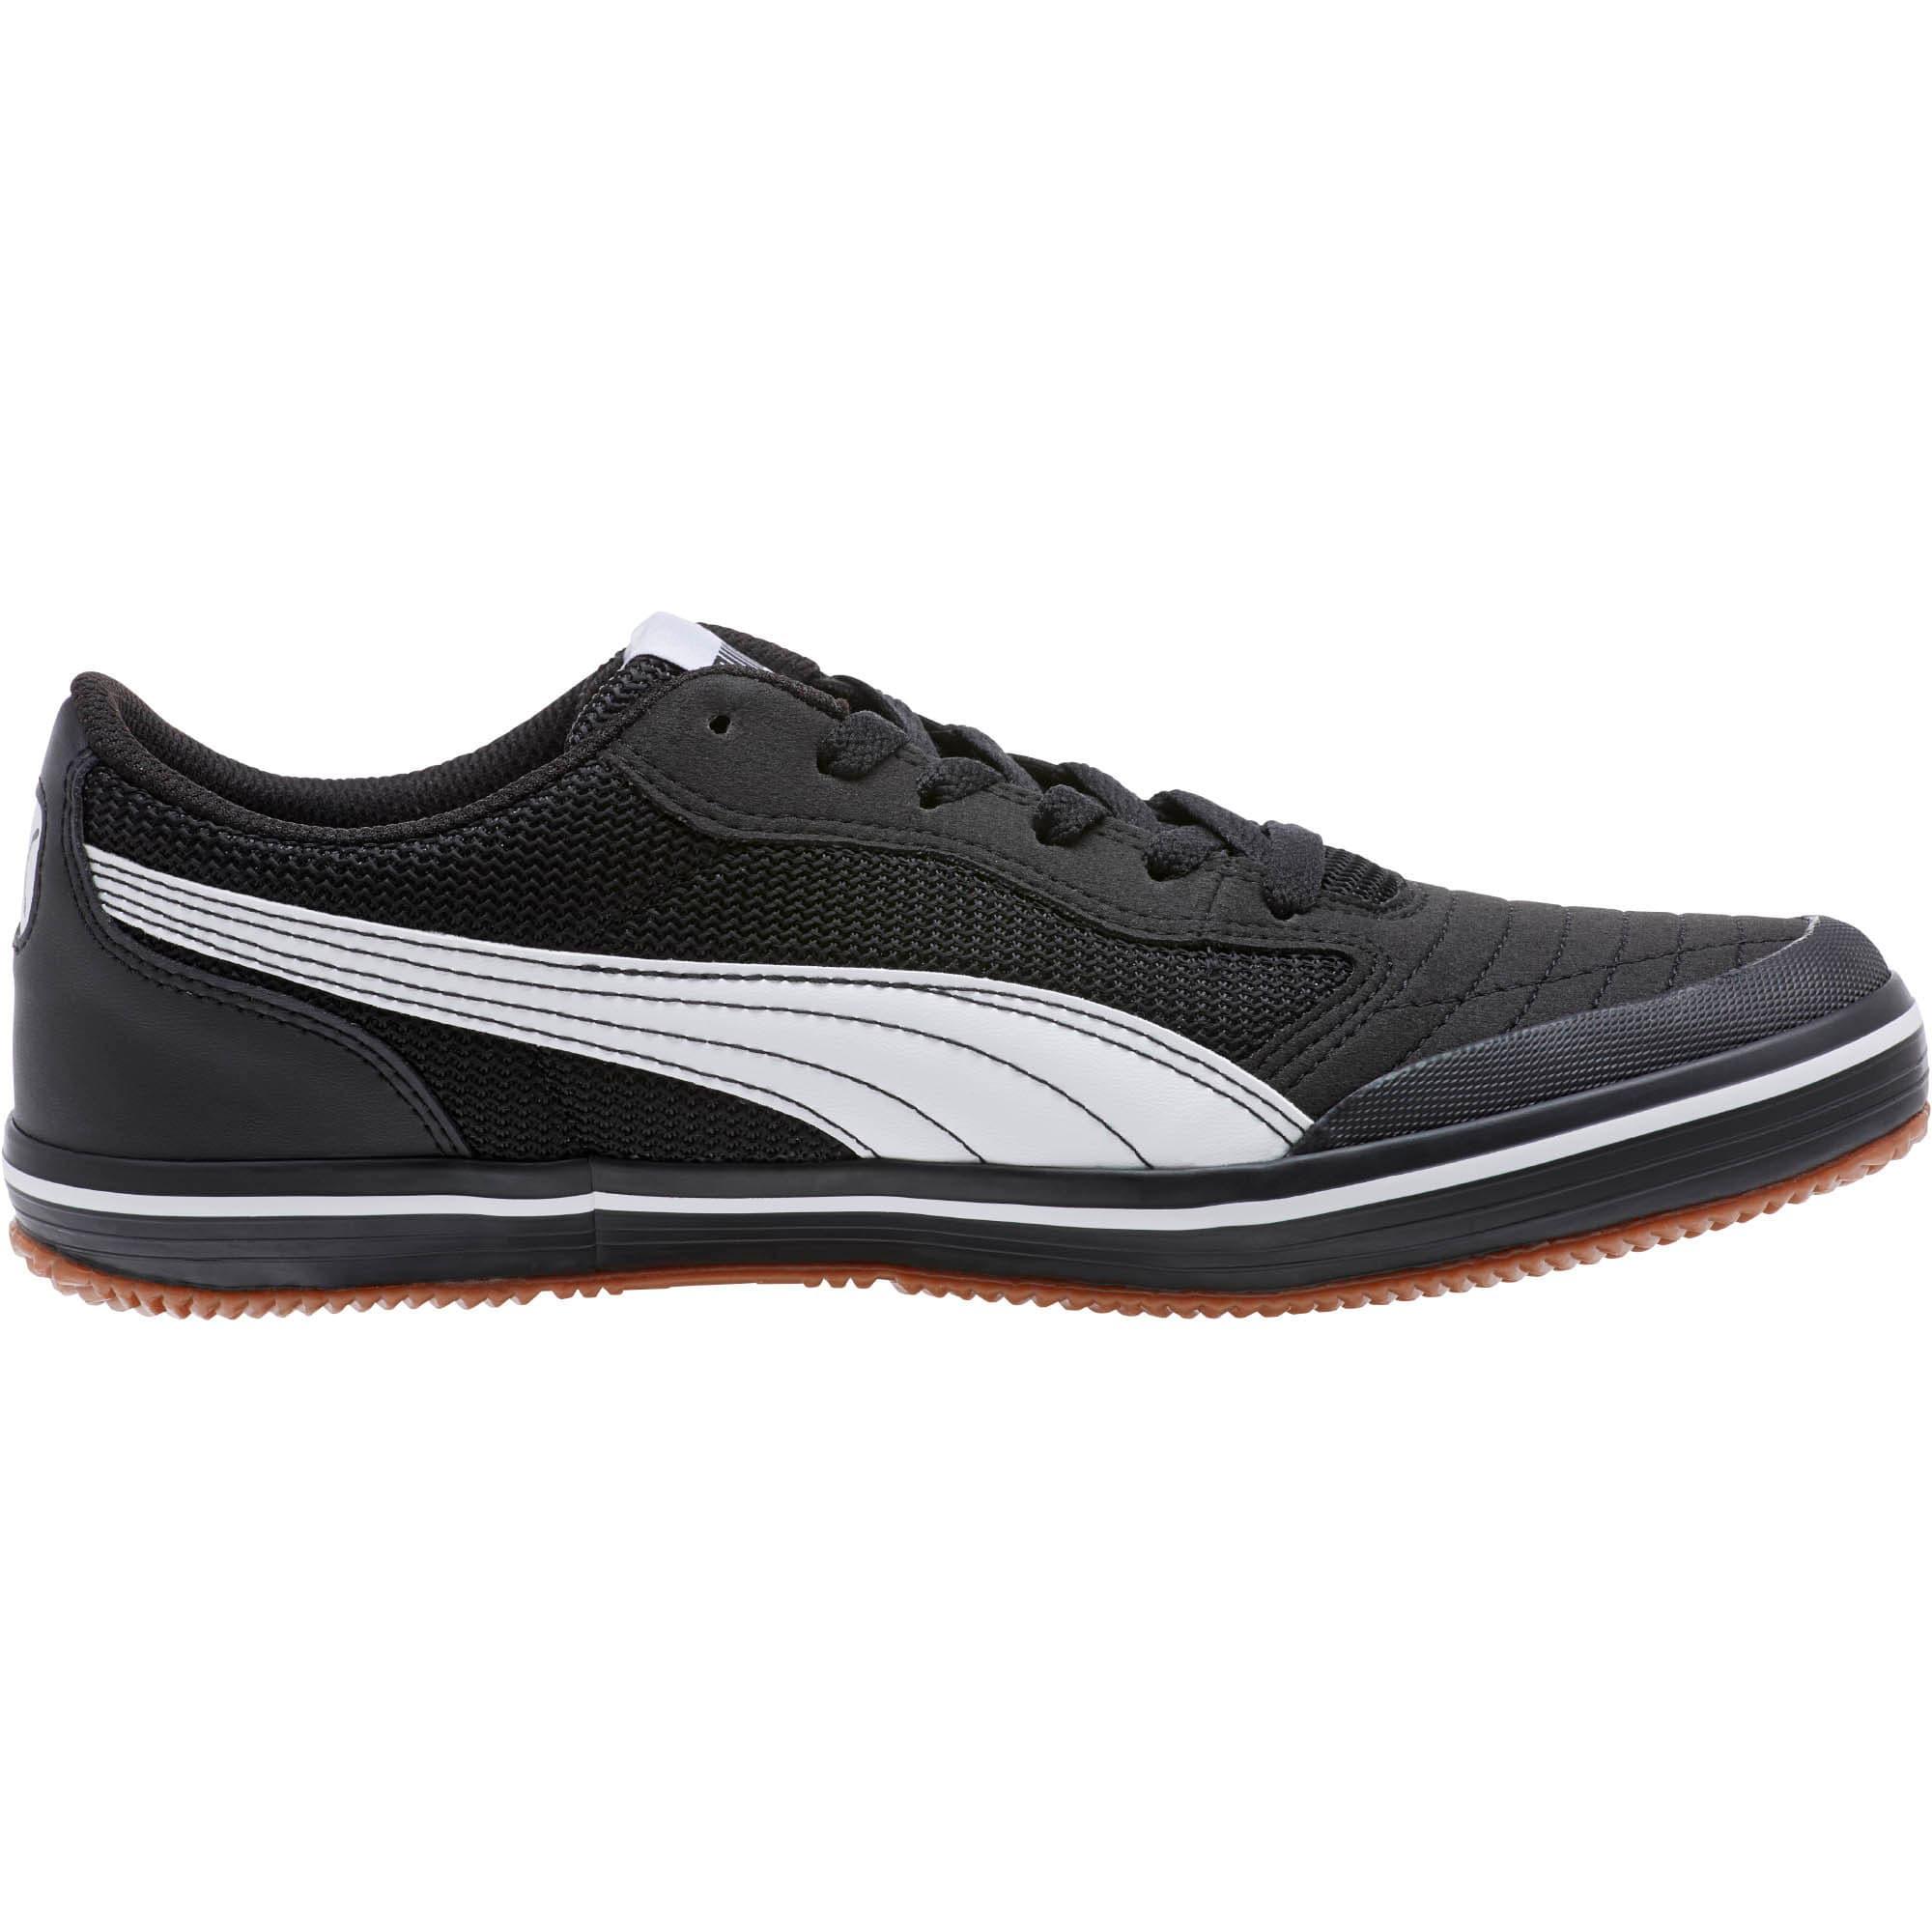 Thumbnail 3 of Astro Sala Sneakers, Puma Black-Puma White, medium